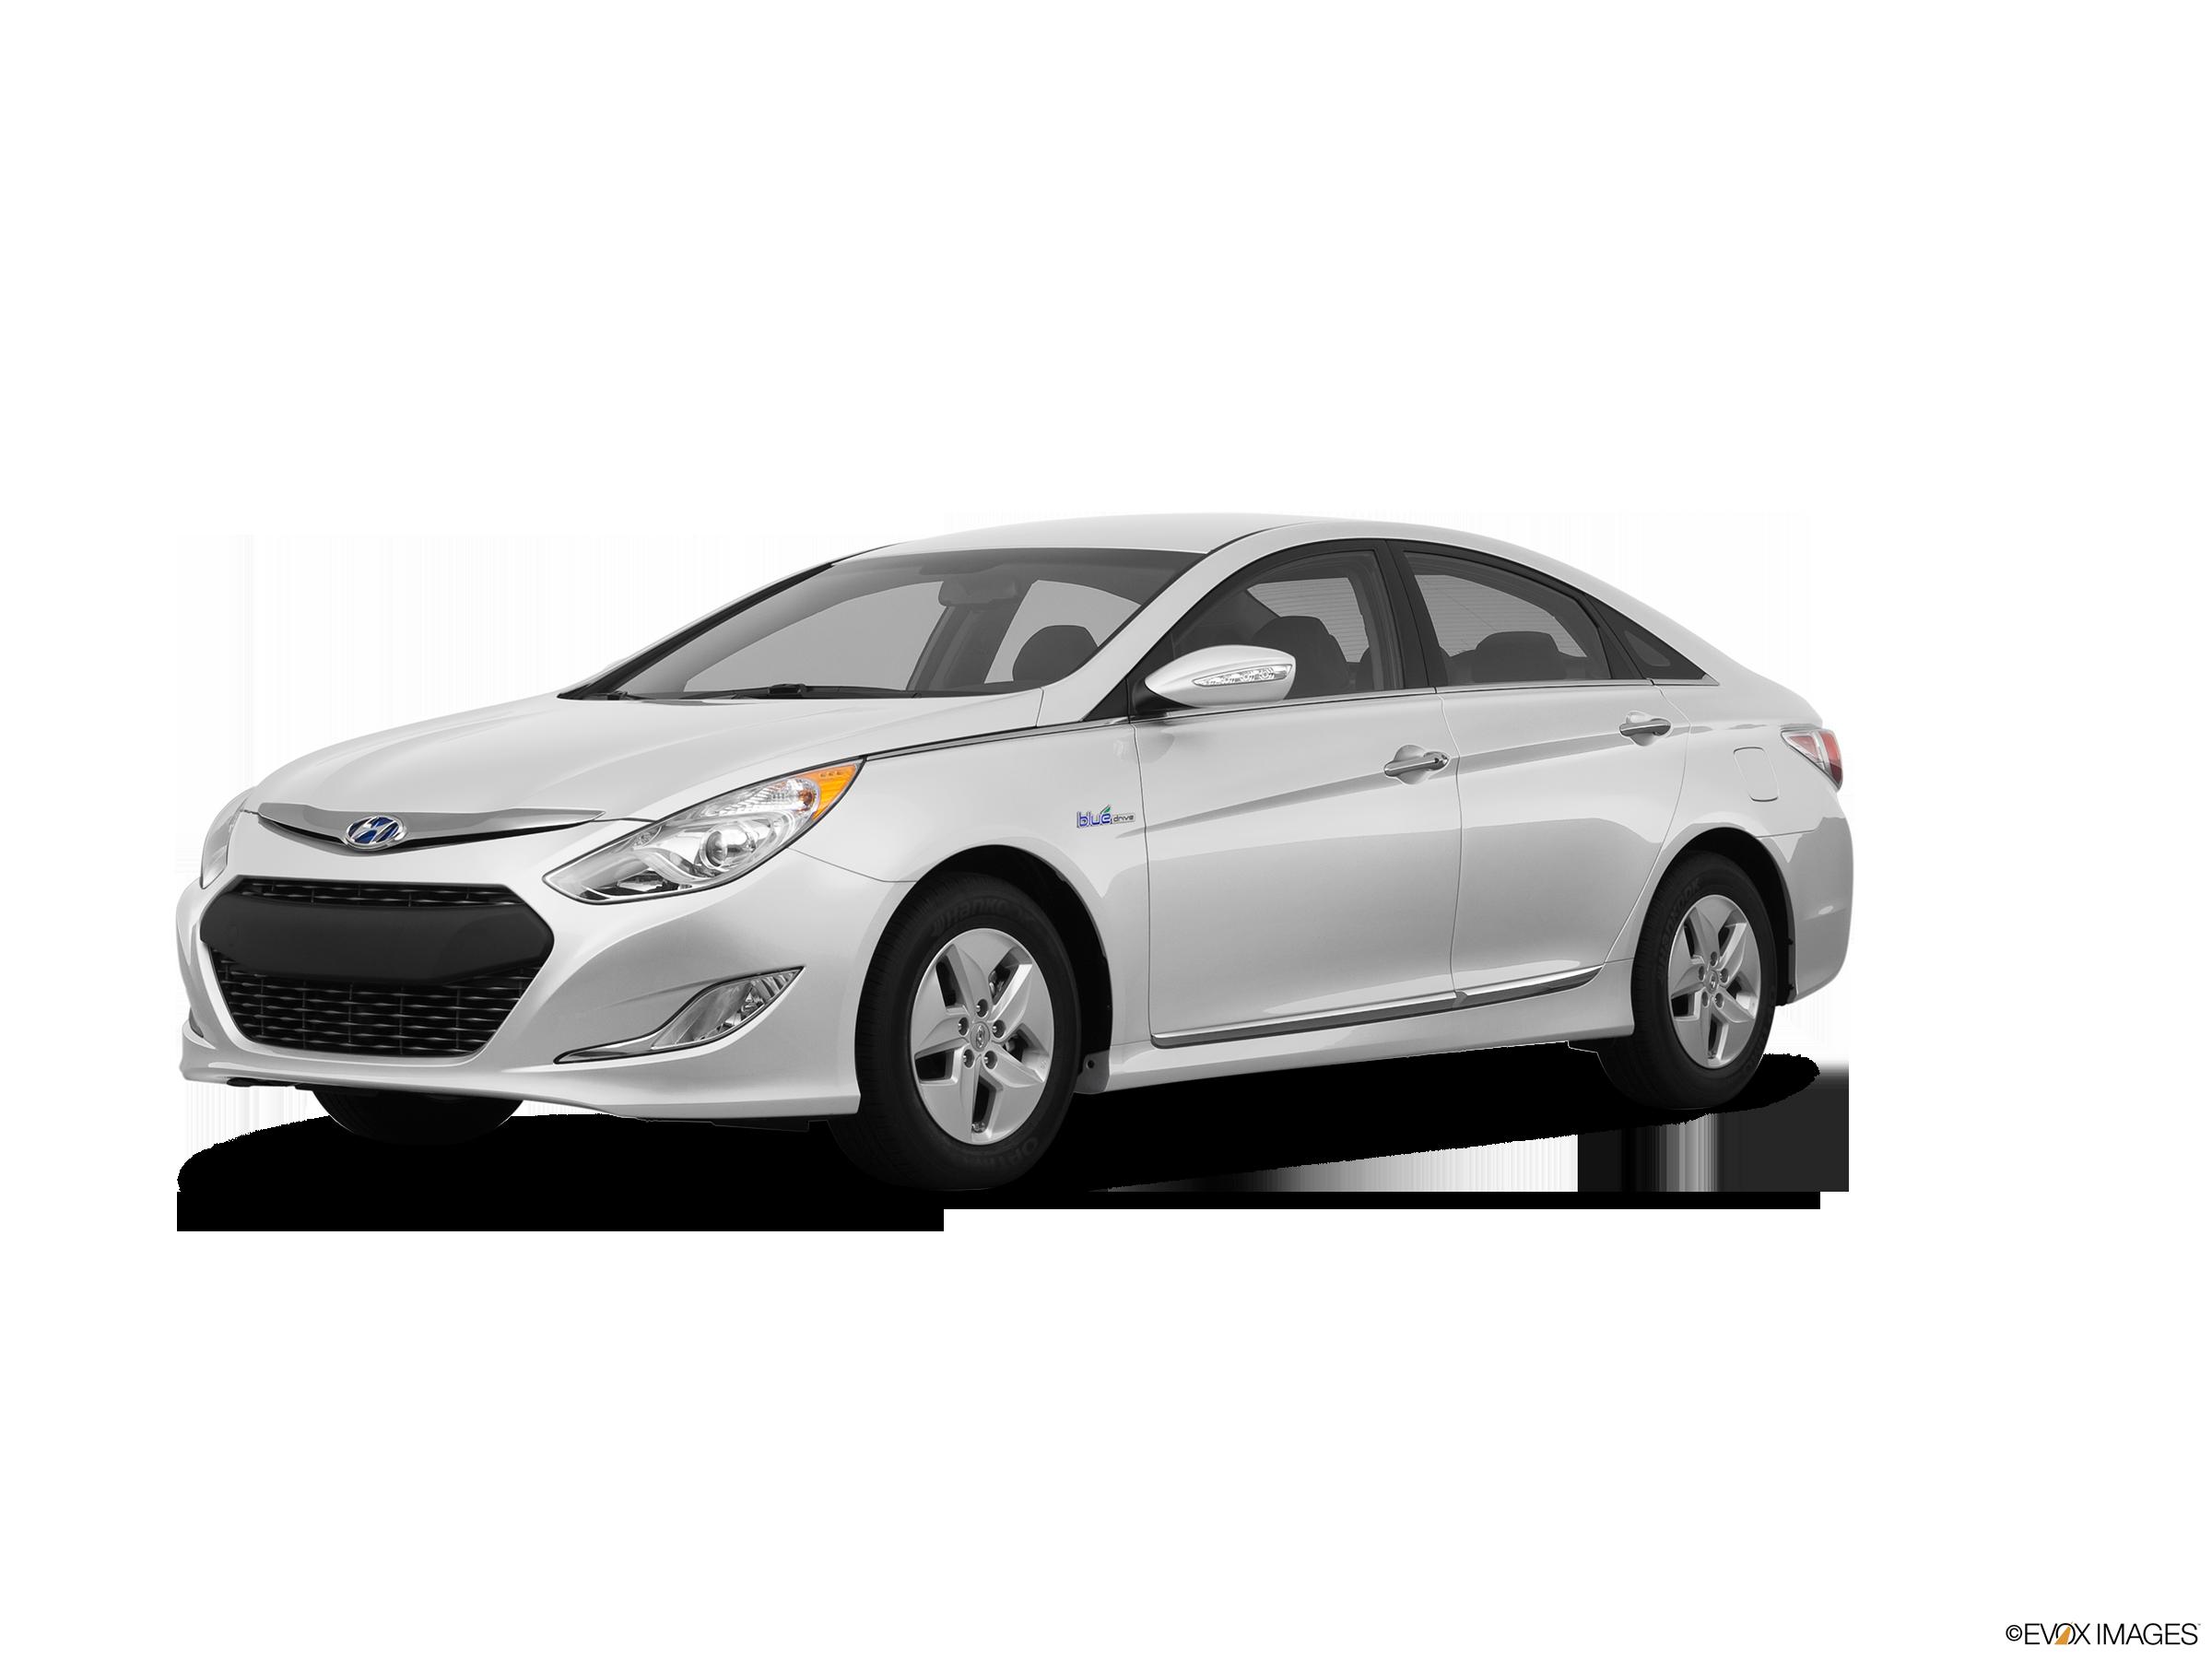 2012 hyundai sonata values cars for sale kelley blue book 2012 hyundai sonata values cars for